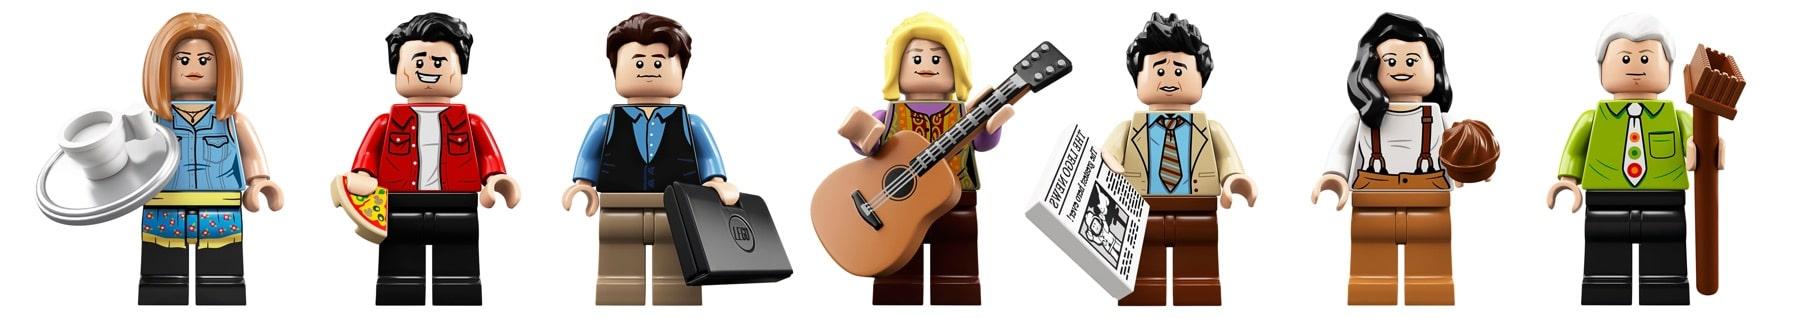 LEGO 21319 Central Perk Minifigures